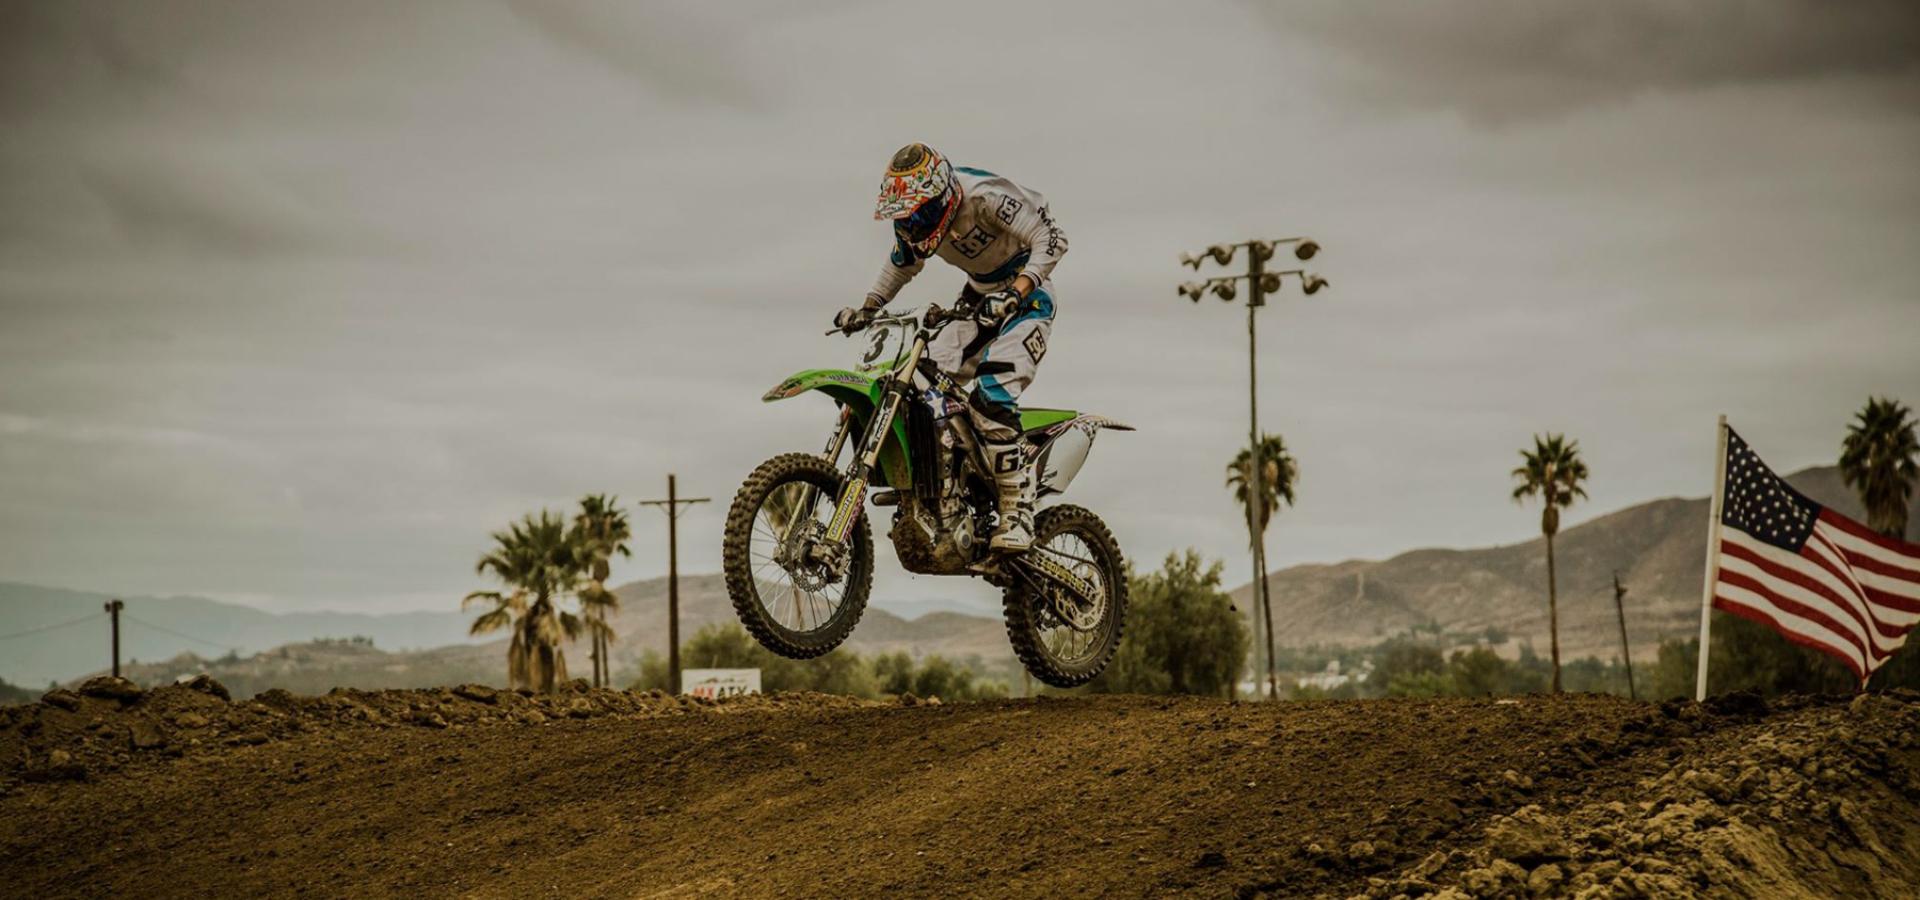 kawasaki-motocross_1800x930px